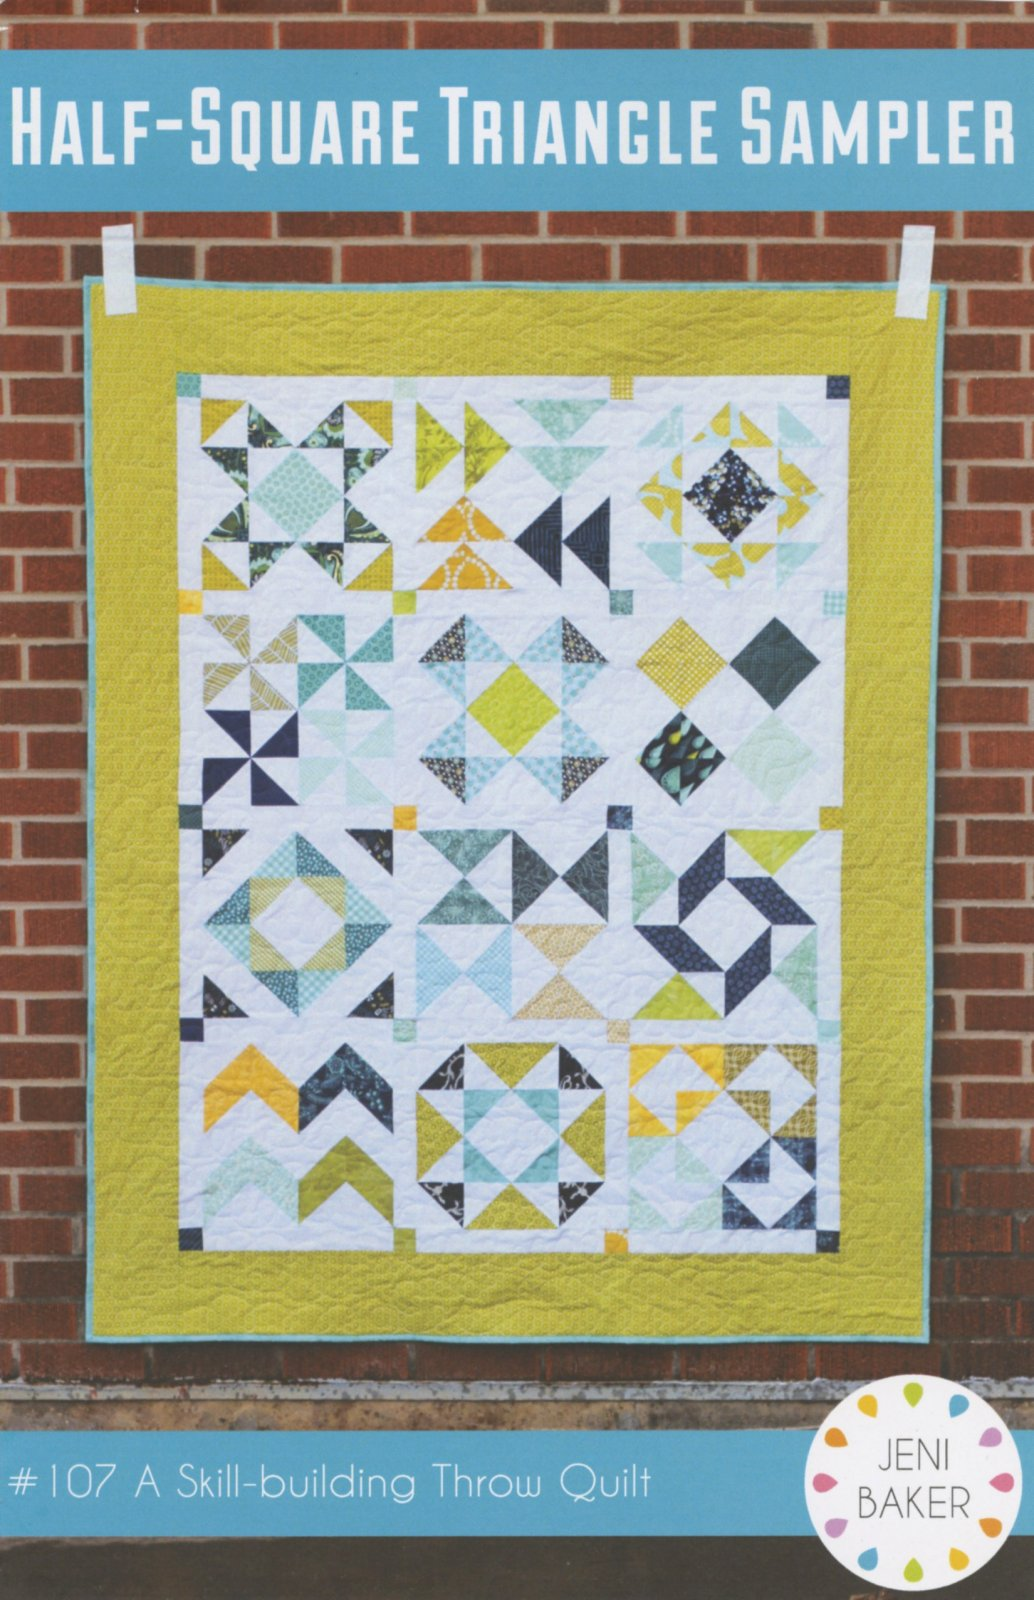 Half-Square Triangle Sampler Quilt